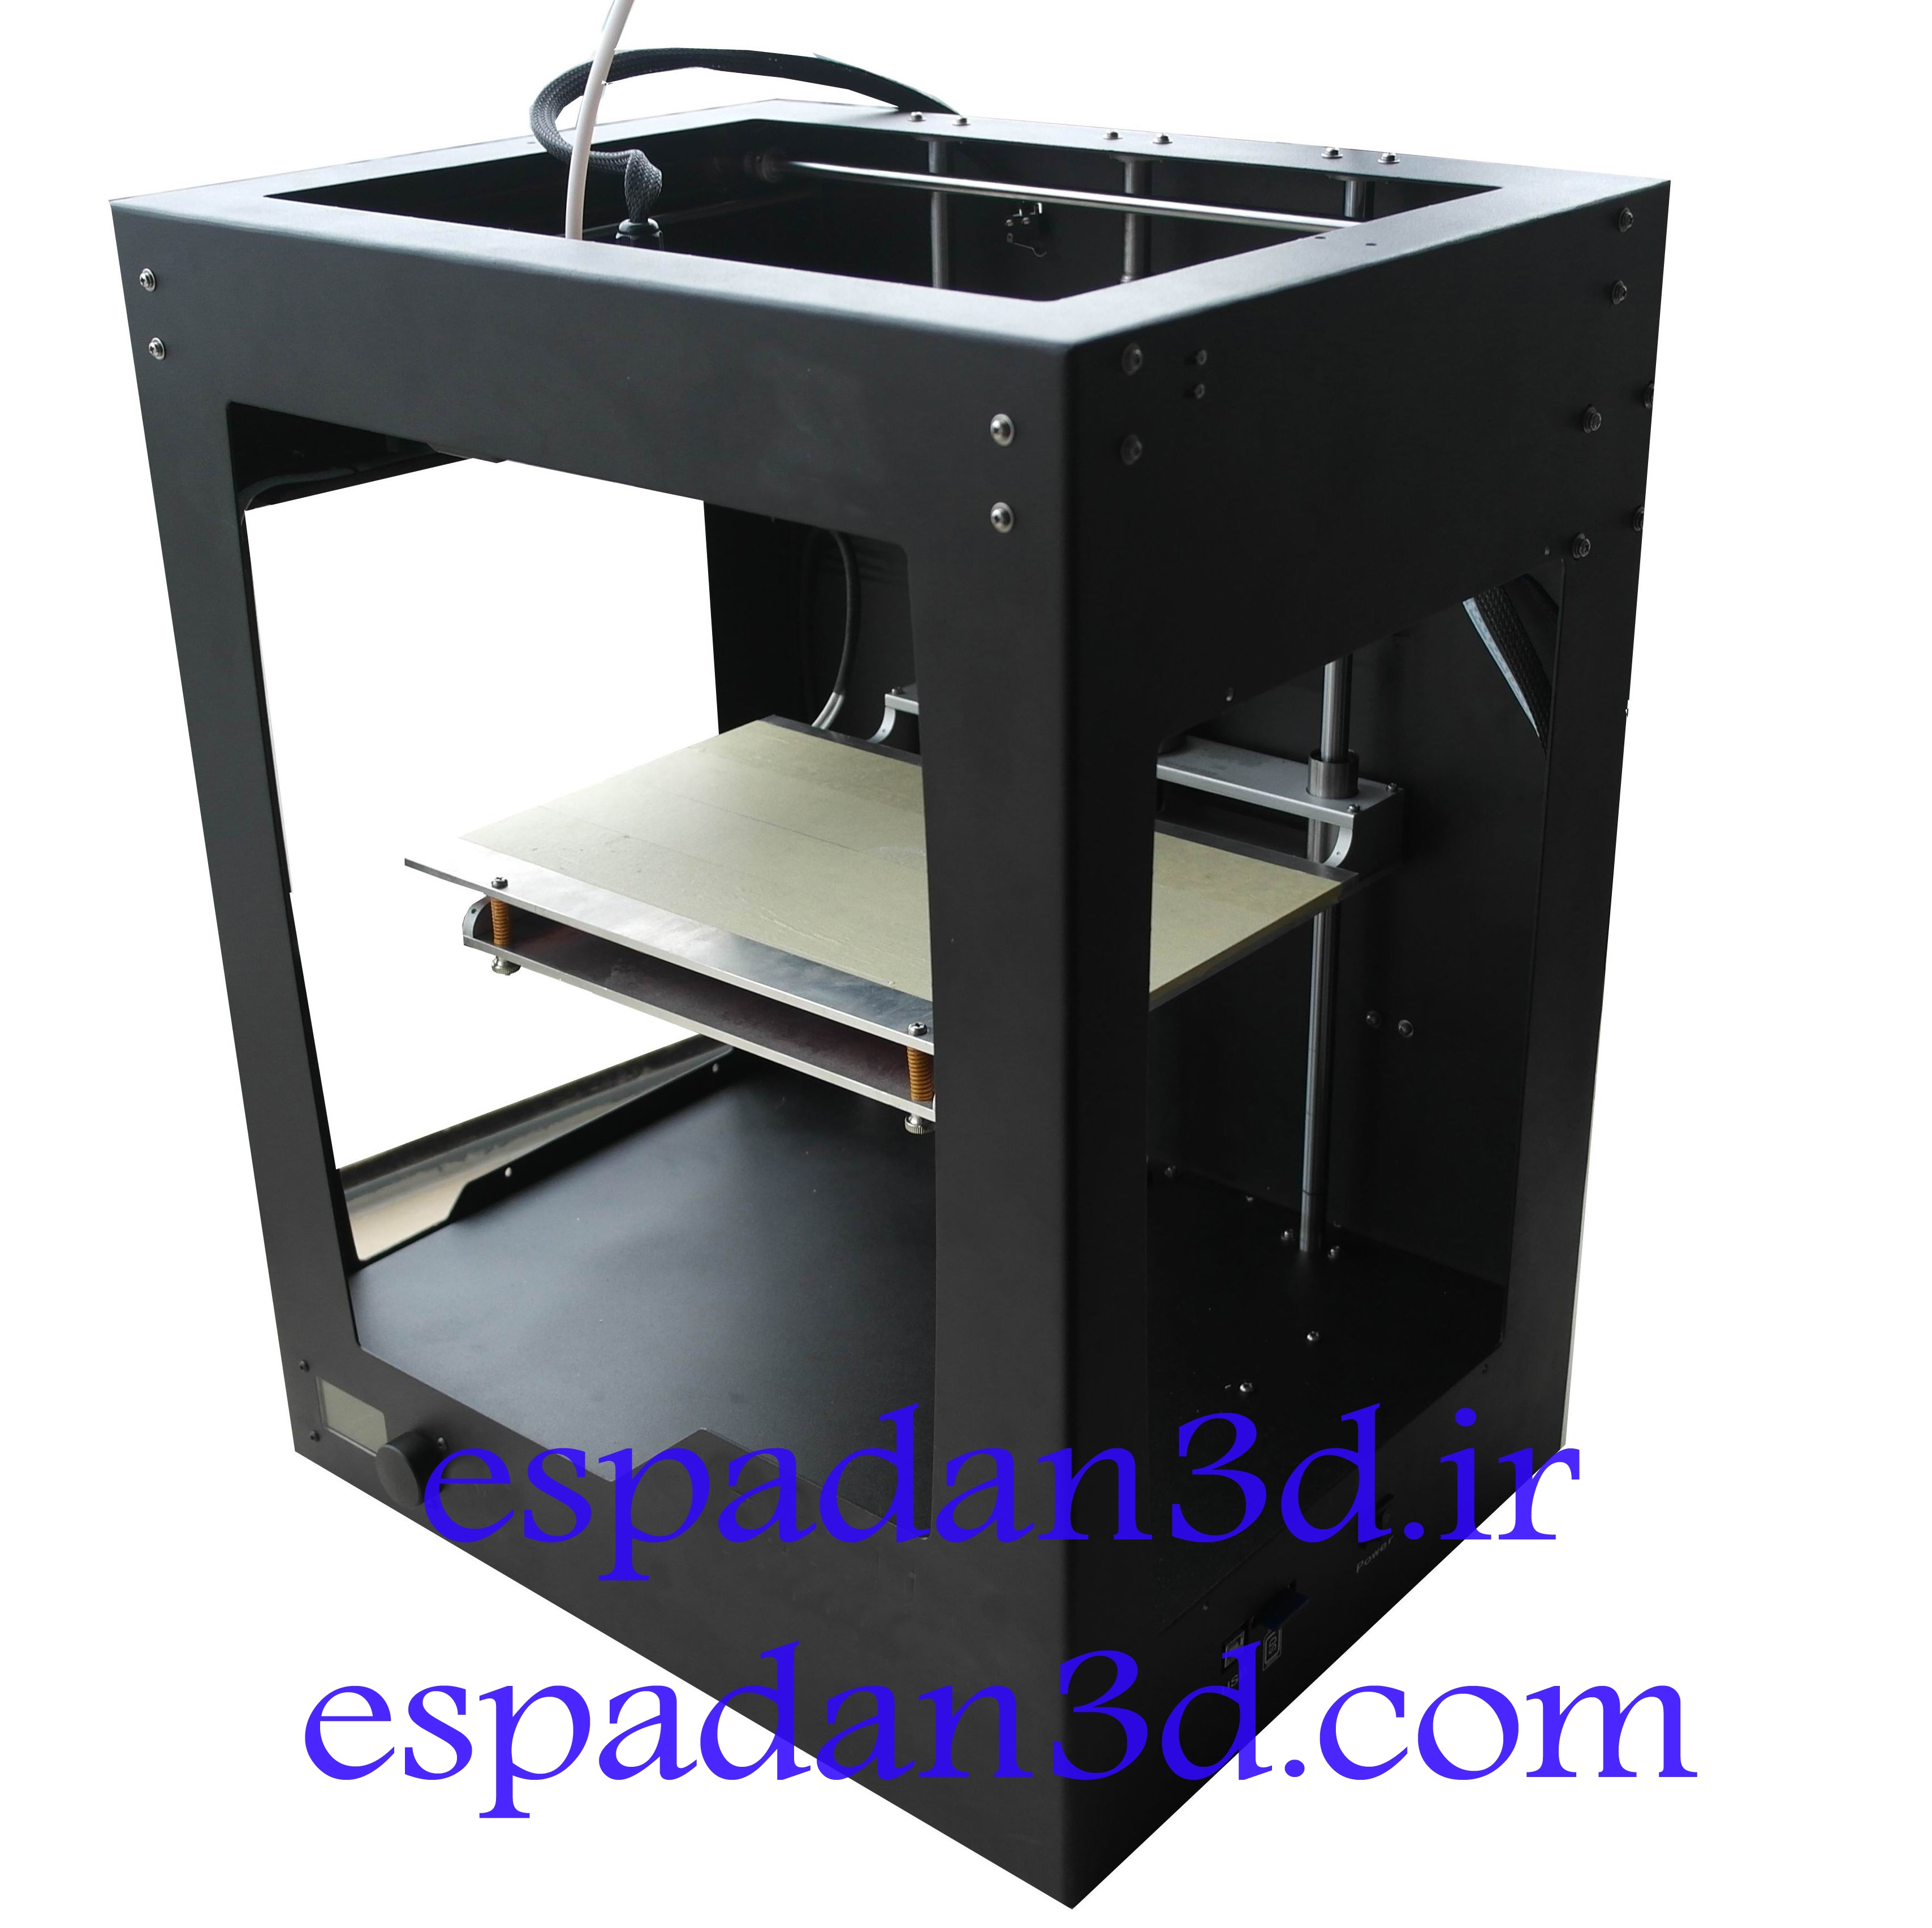 خدمات چاپ سه بعدی